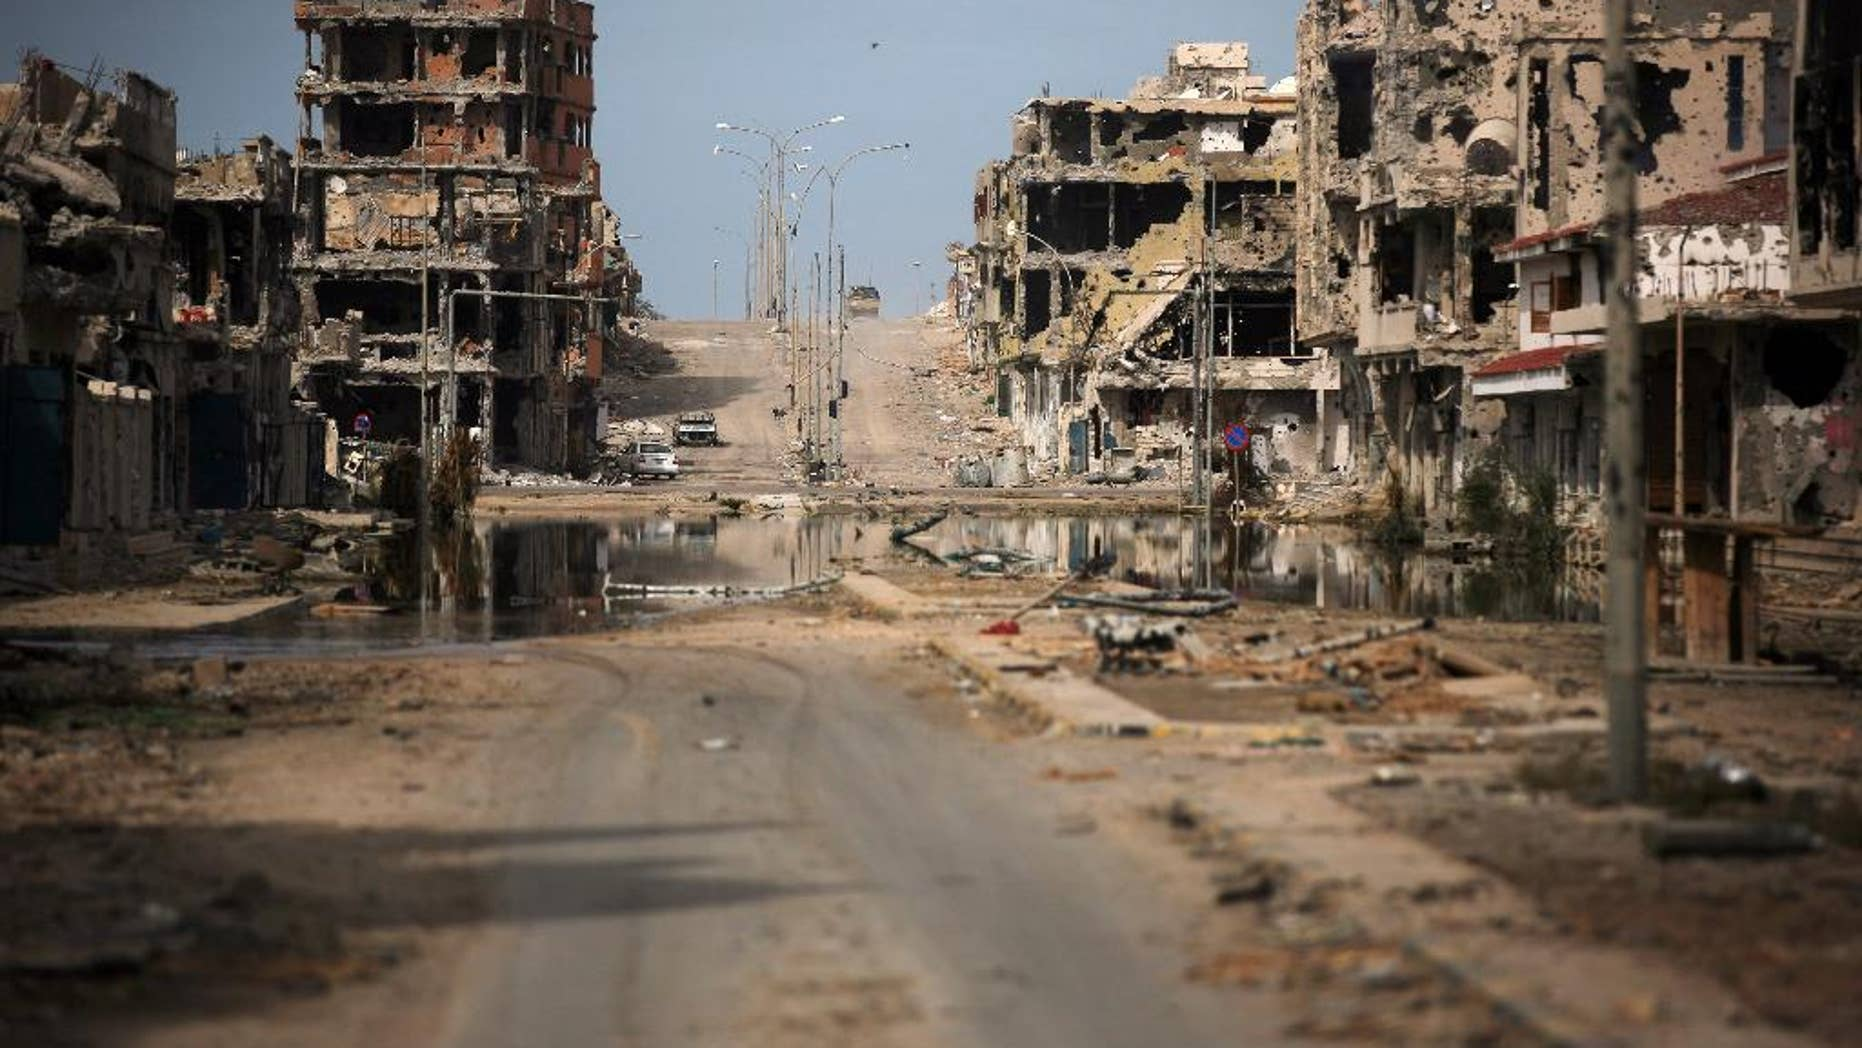 Oct. 22, 2011: A general view of buildings ravaged by fighting in Sirte, Libya.